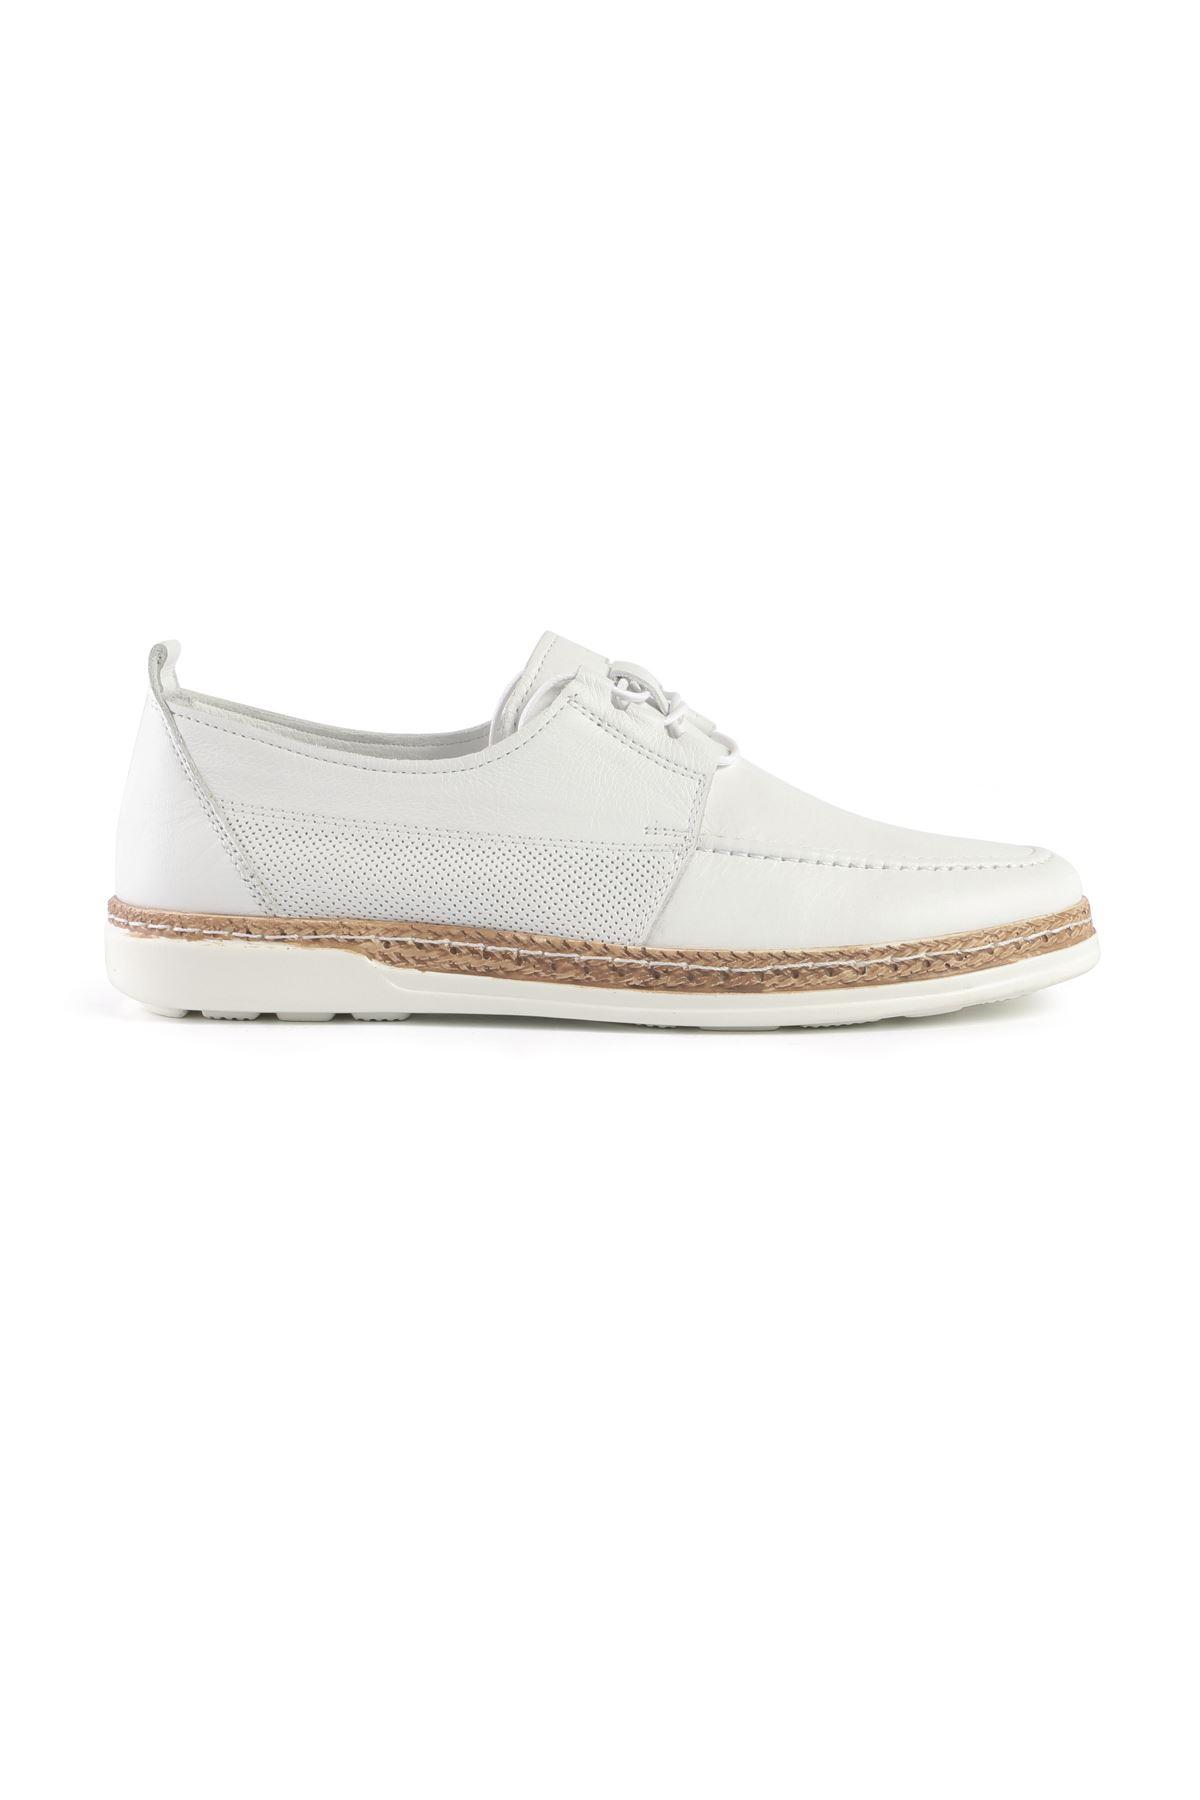 Libero LZ3433 White Babette Shoes